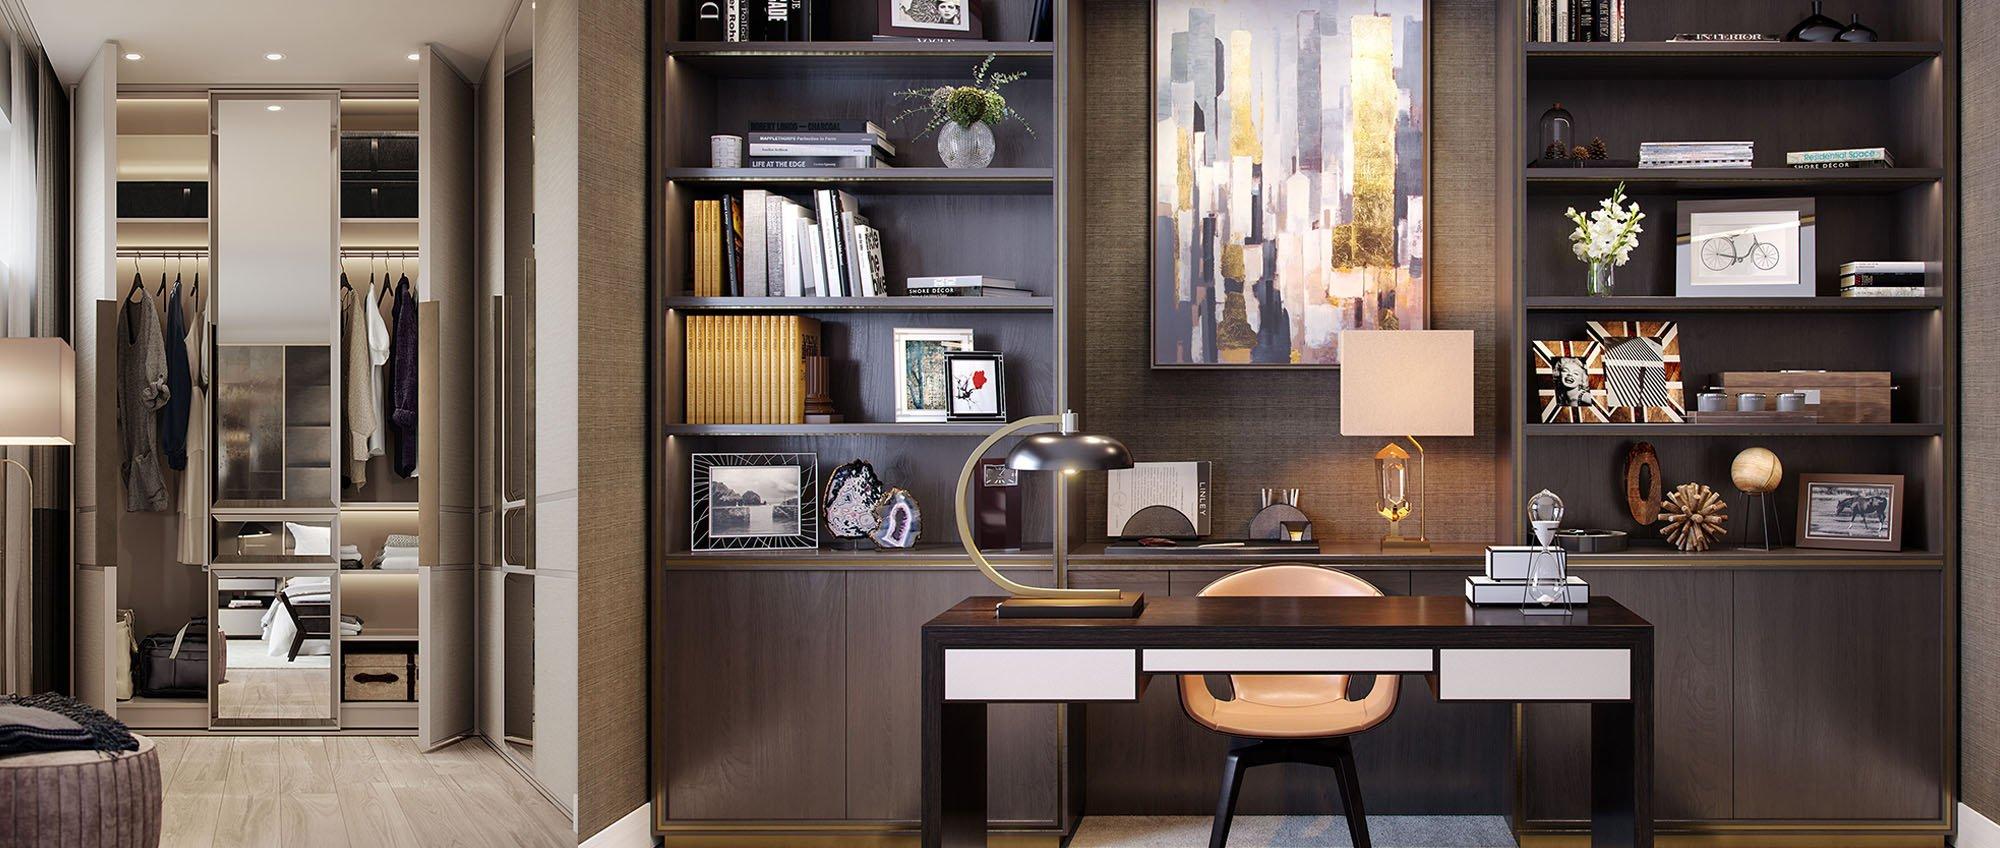 Vantage Interior Visualisation by F10 Studios